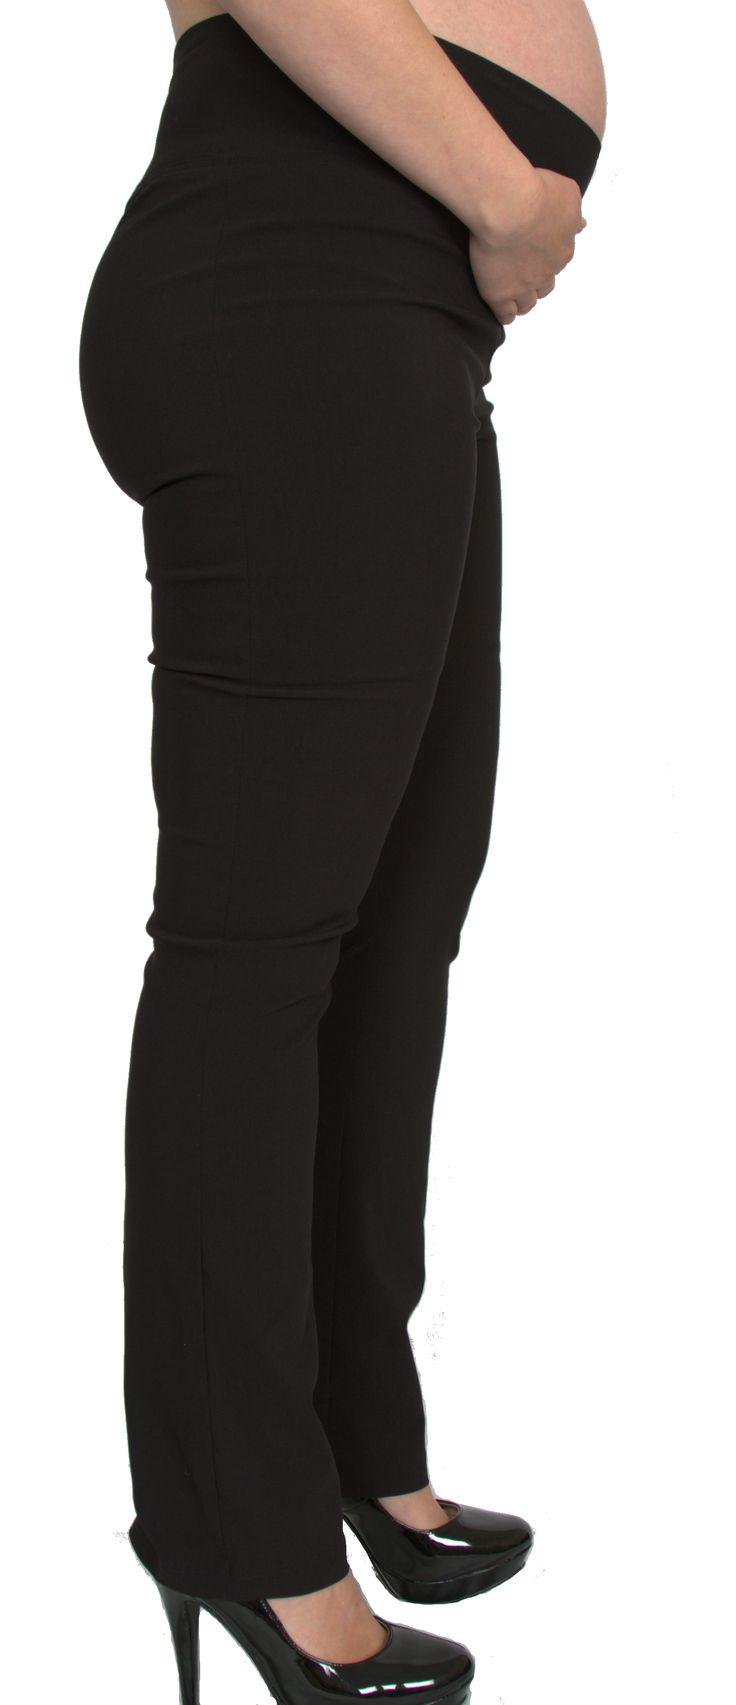 Straight leg materity pants from ljb maternity